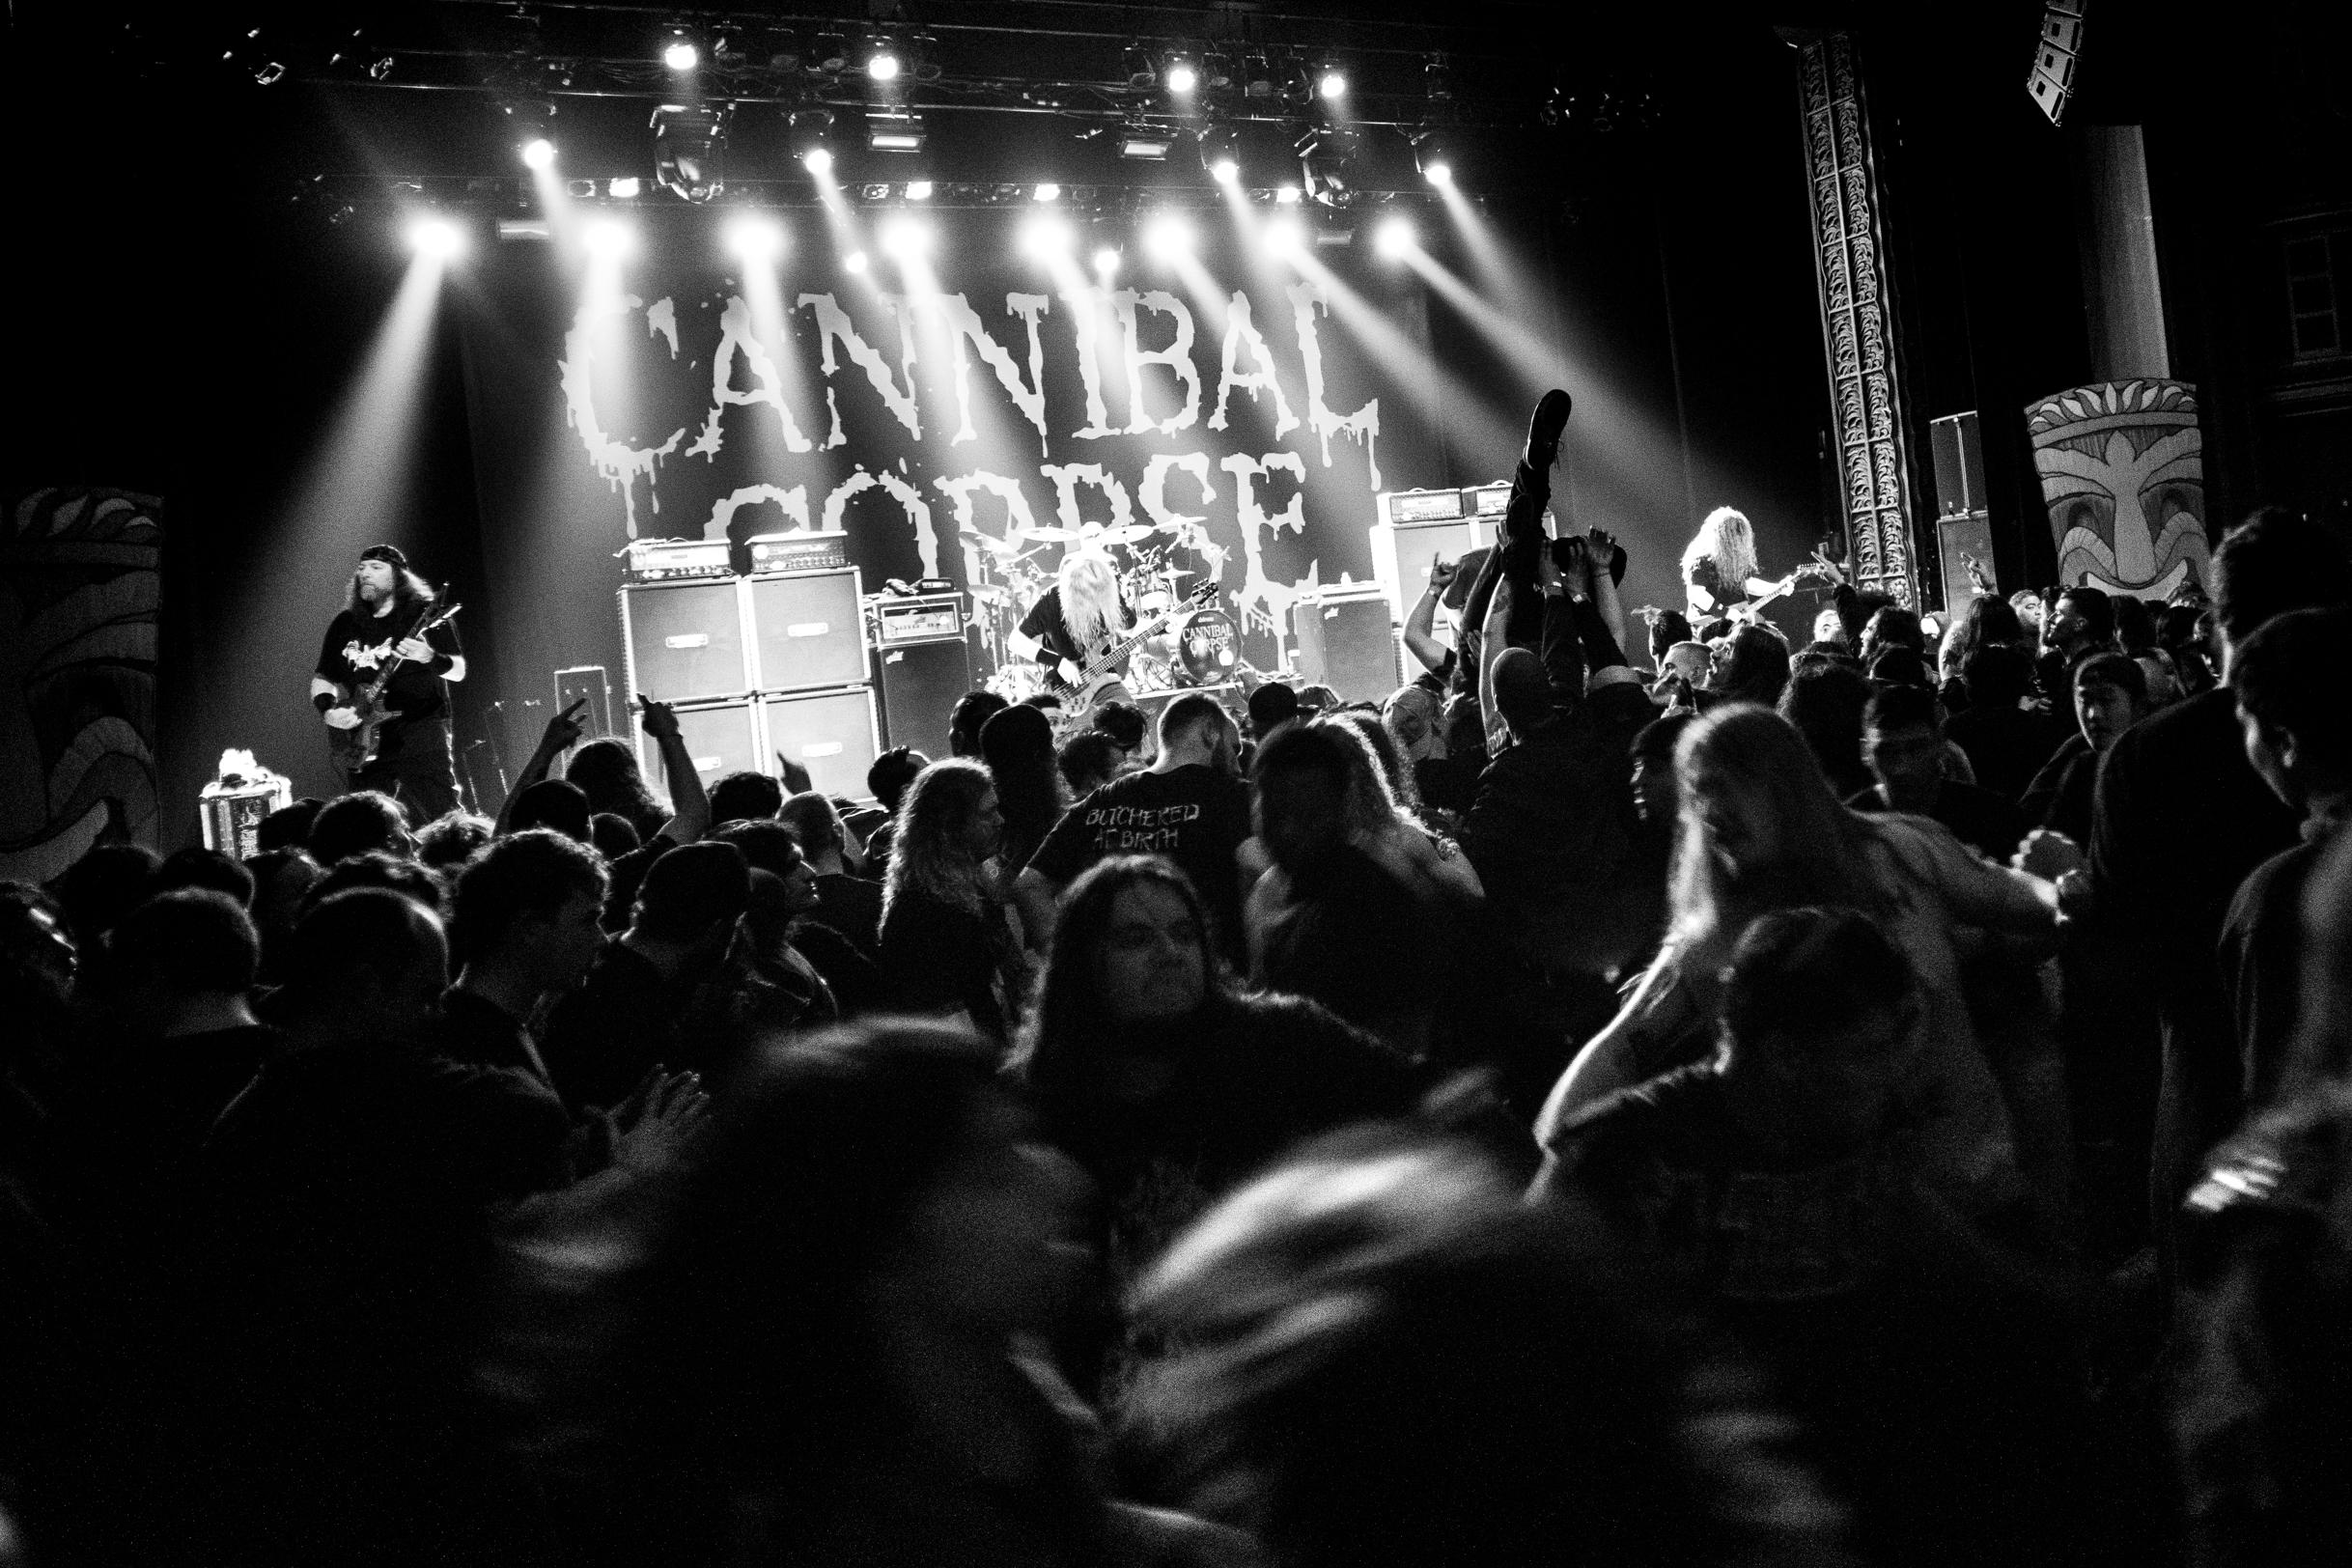 Cannibal Corpse performs at Decibel Magazine Tour 2019